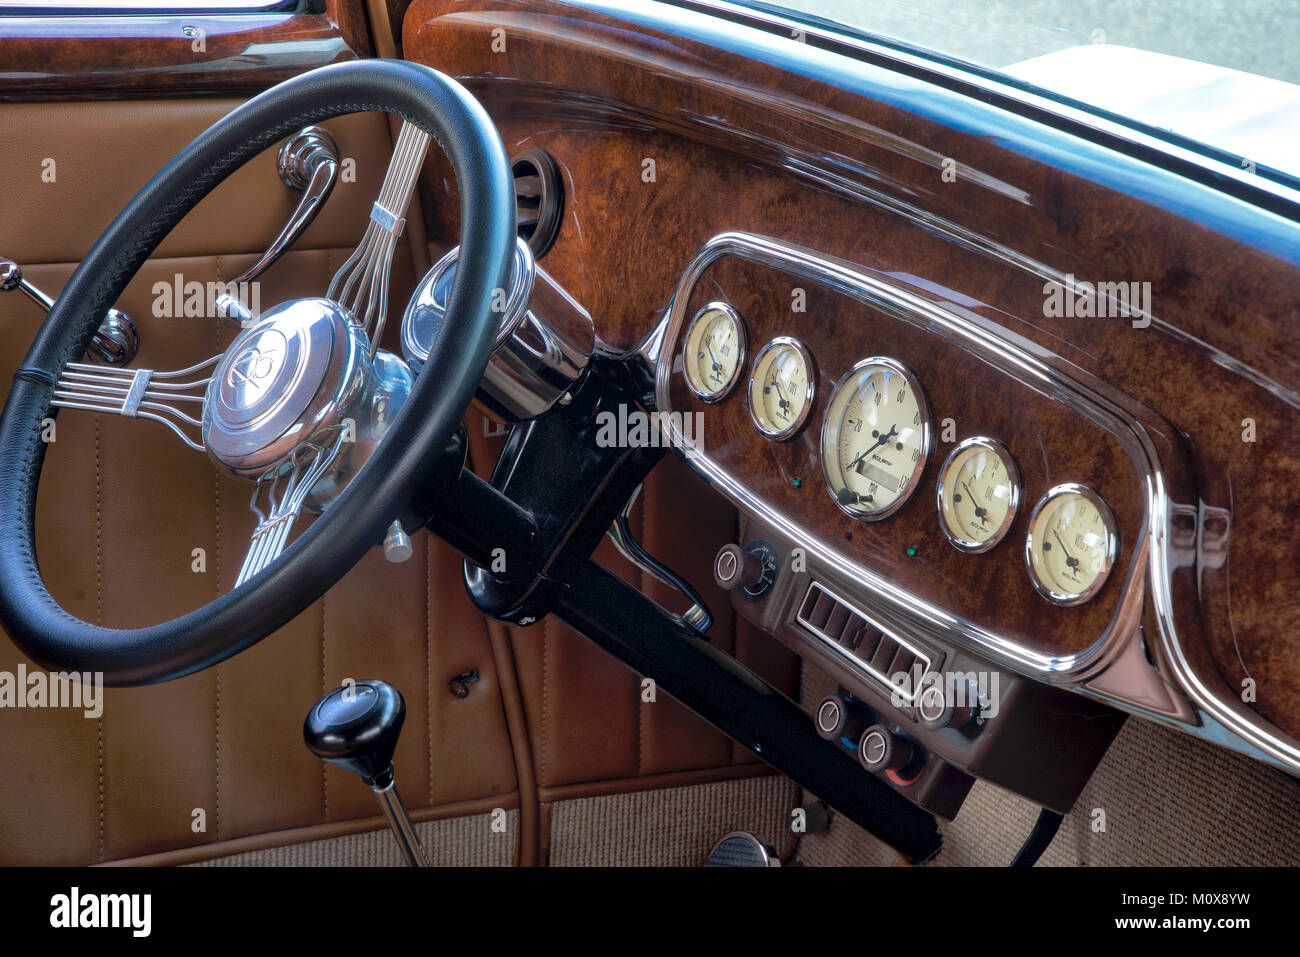 32 Ford restored. Taken in California flower field - Stock Image